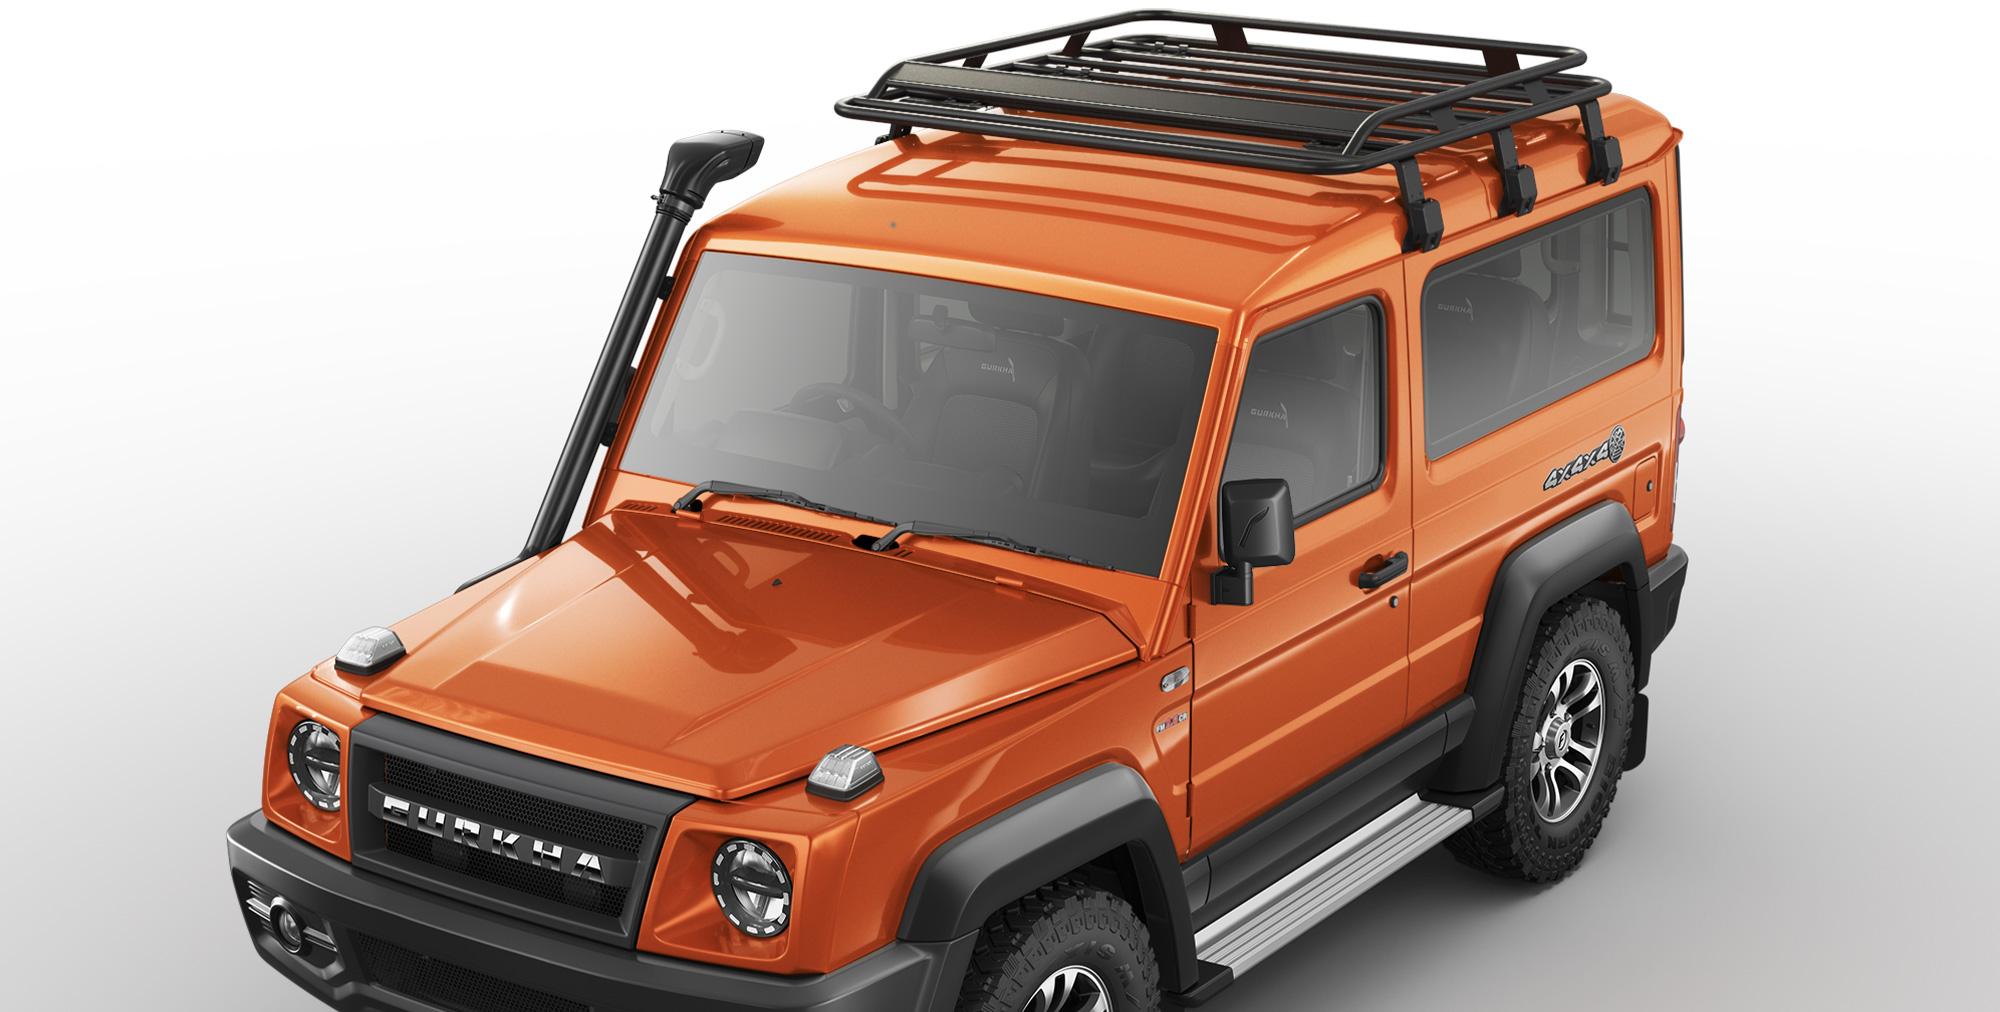 Orange Colour Gurkha 4x4x4 off road car with Roof Carrier